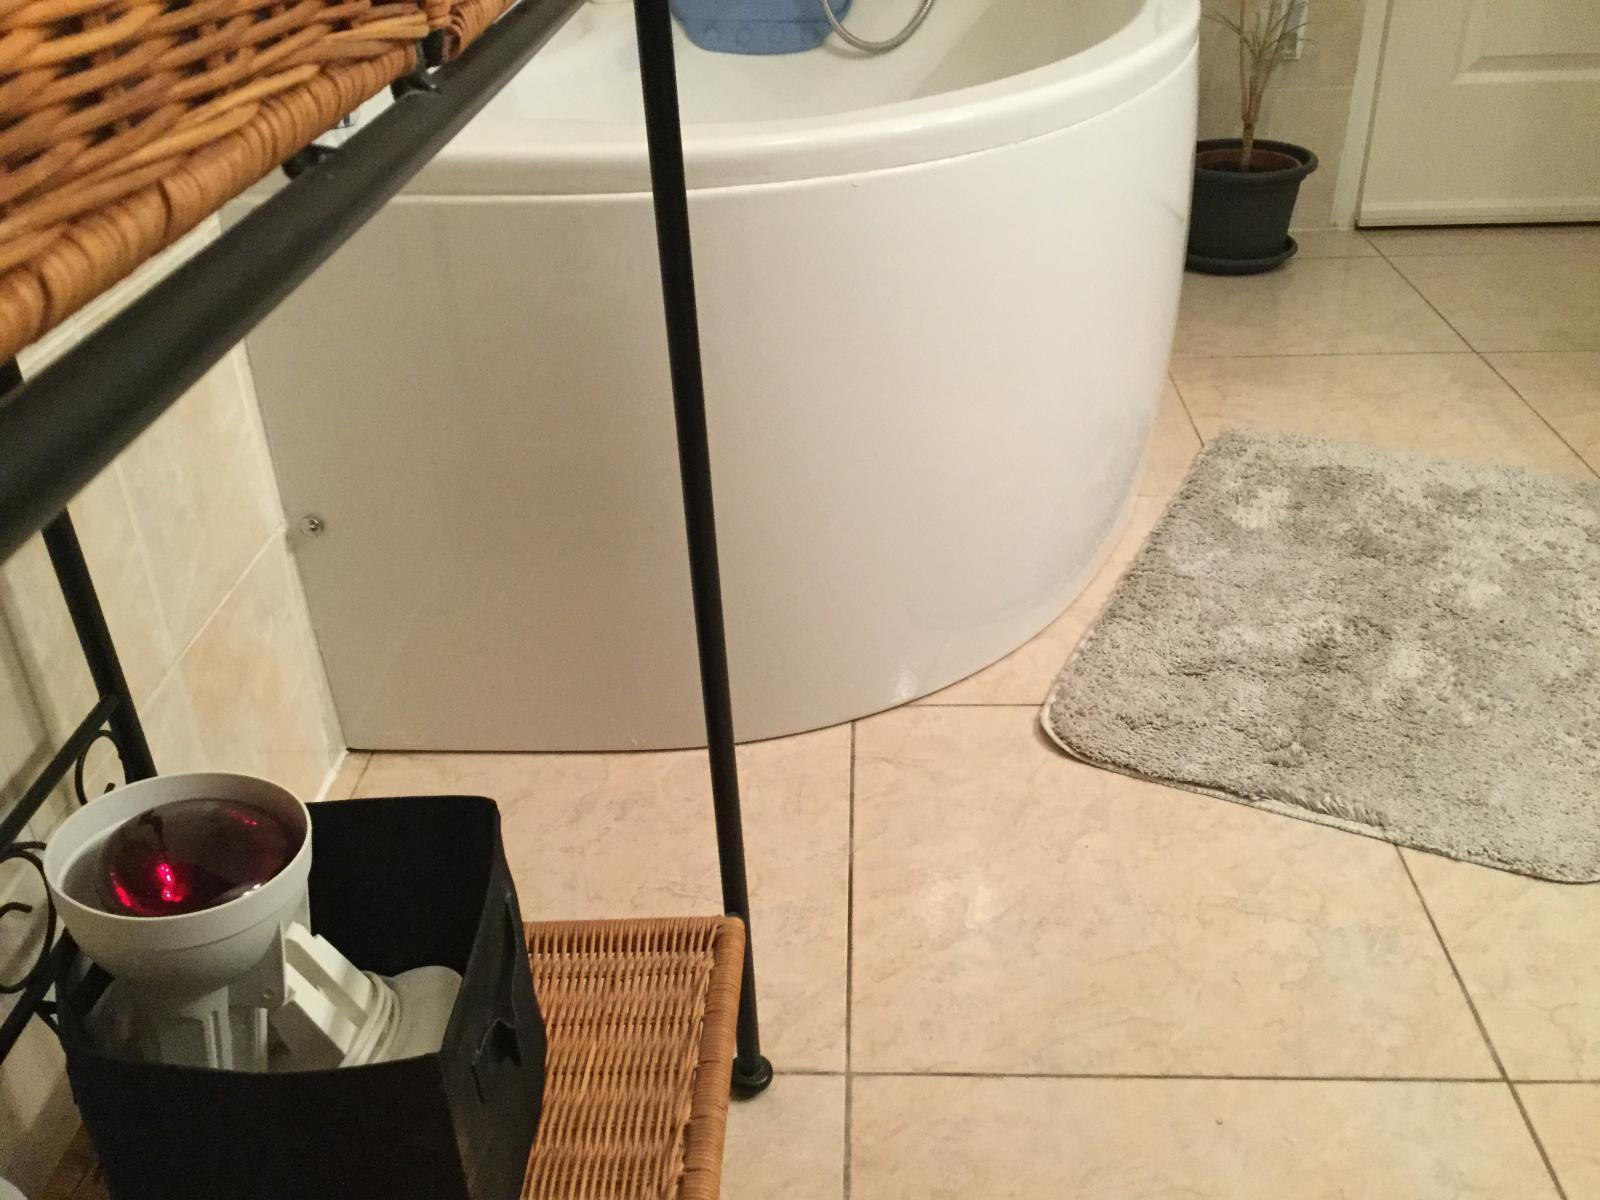 Habillage baignoire - Habillage baignoire pvc ...